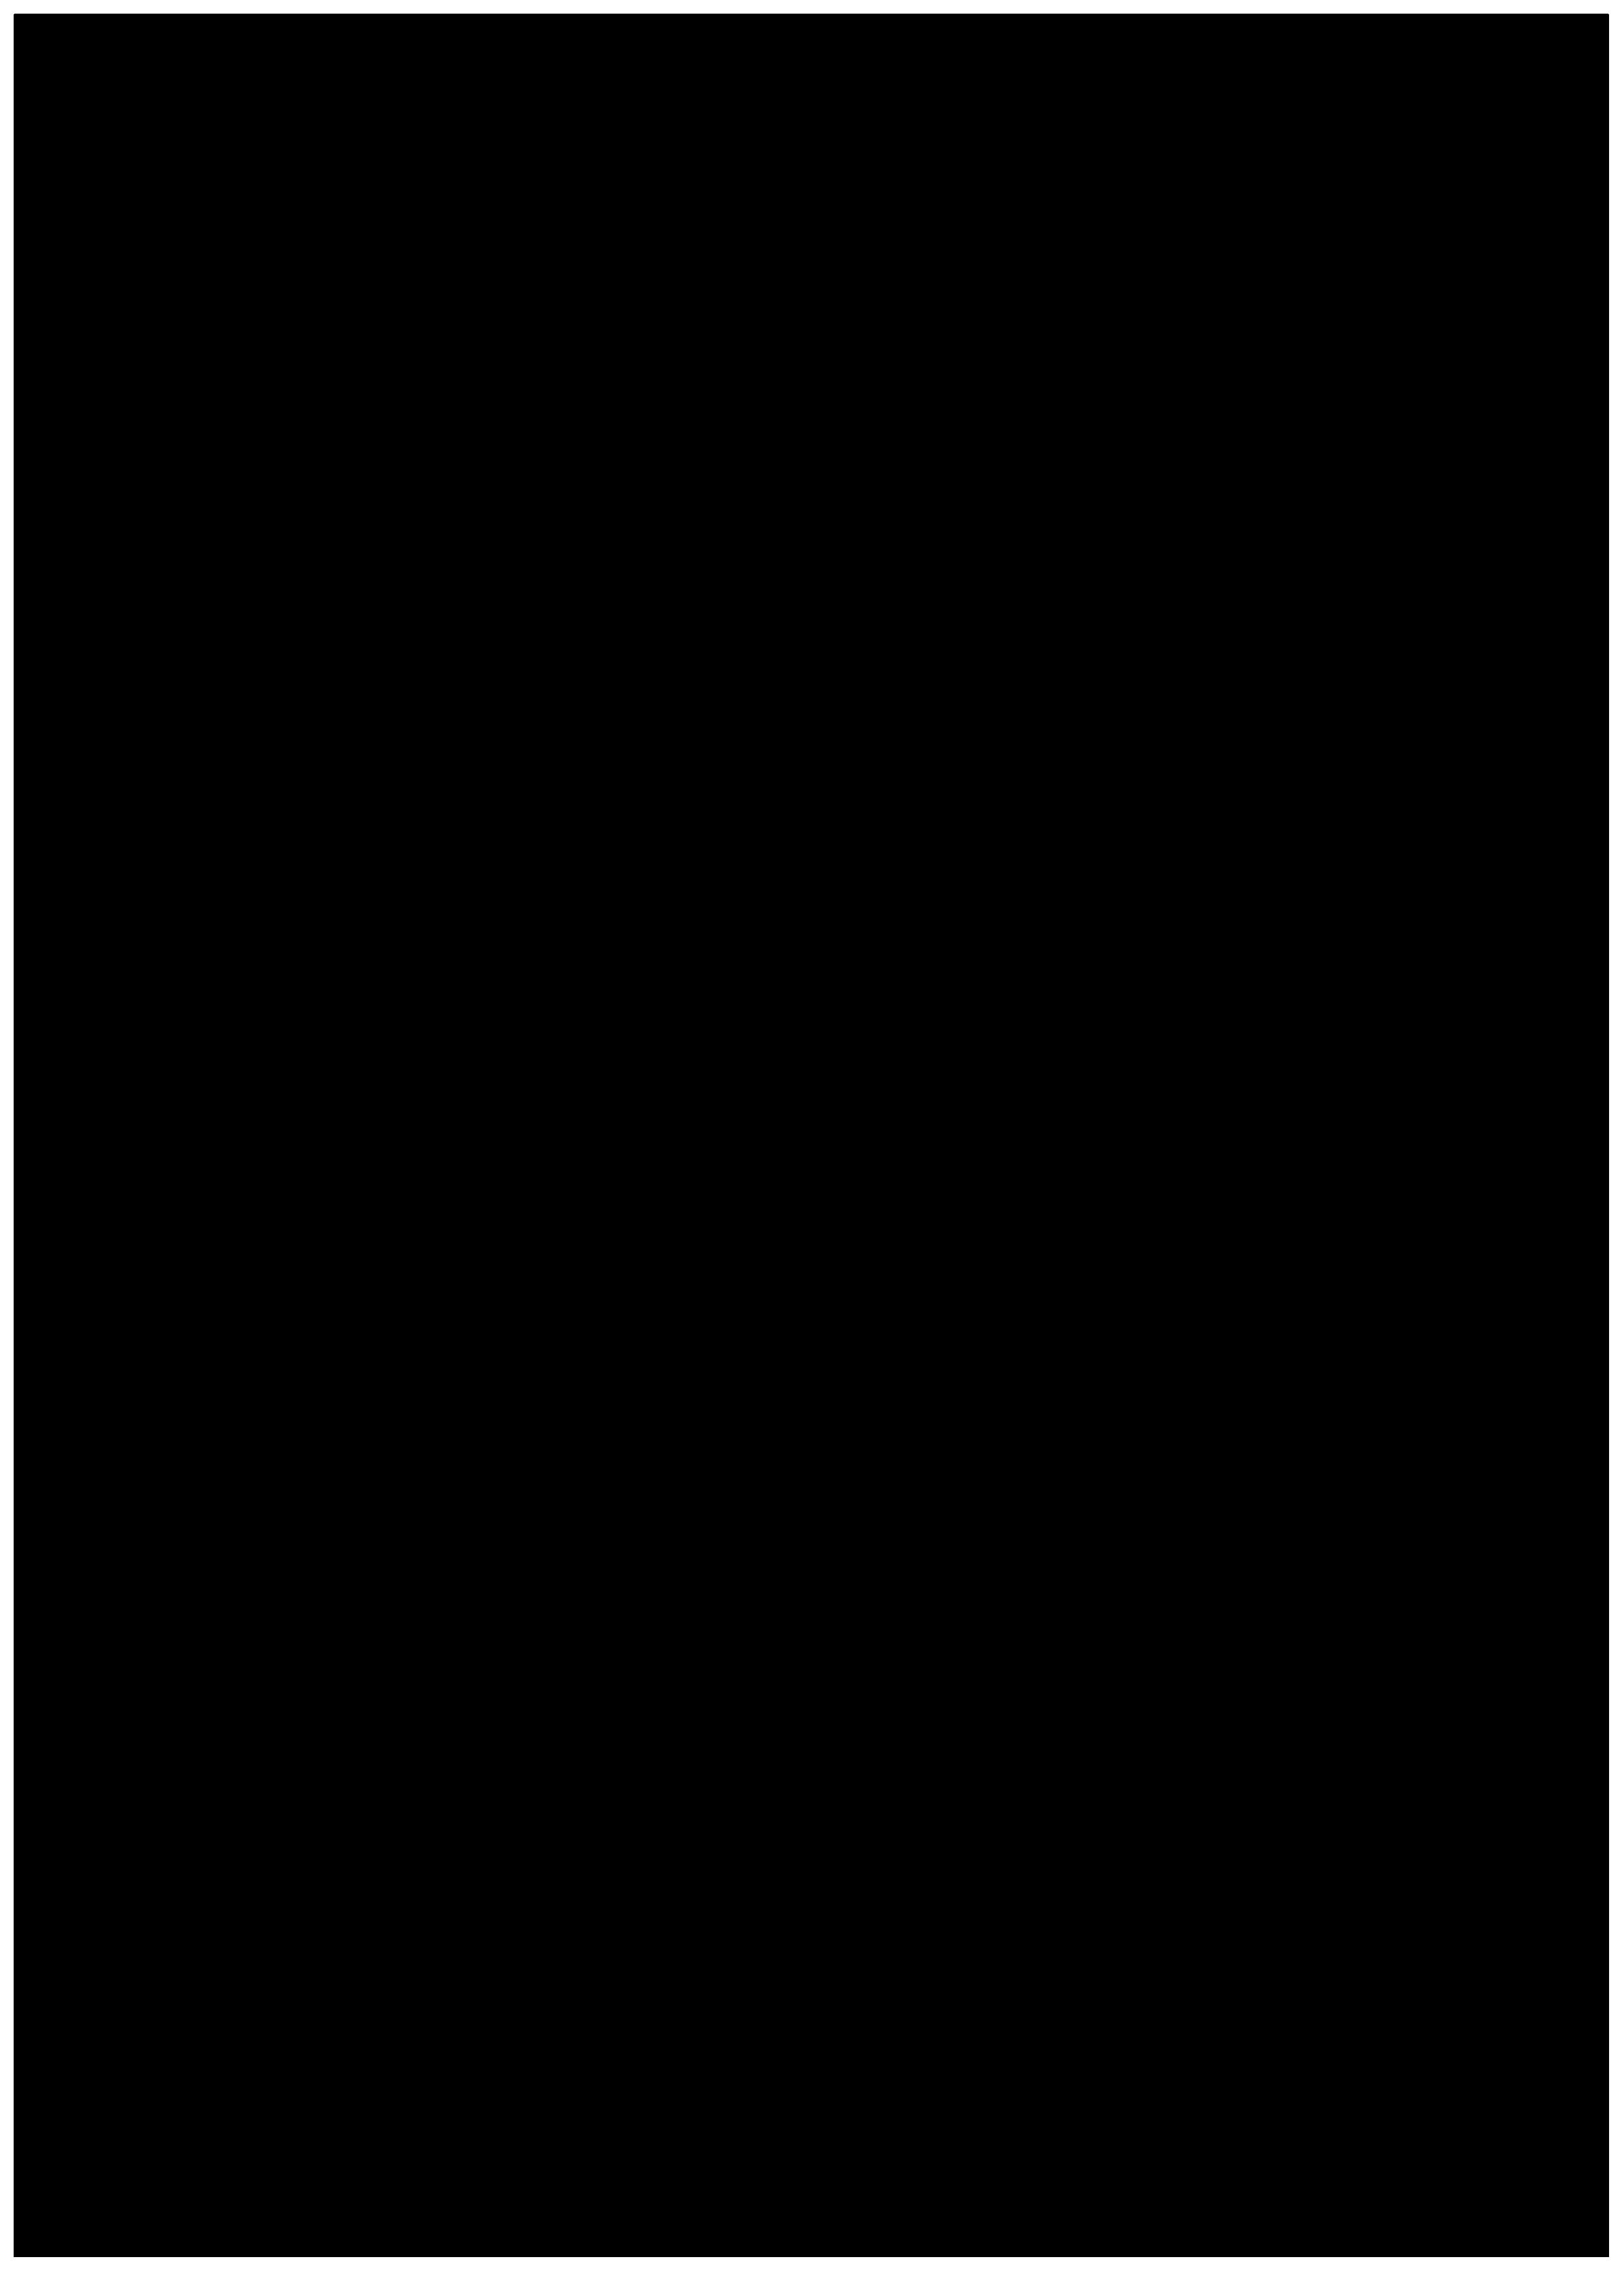 Transparent Graph Paper